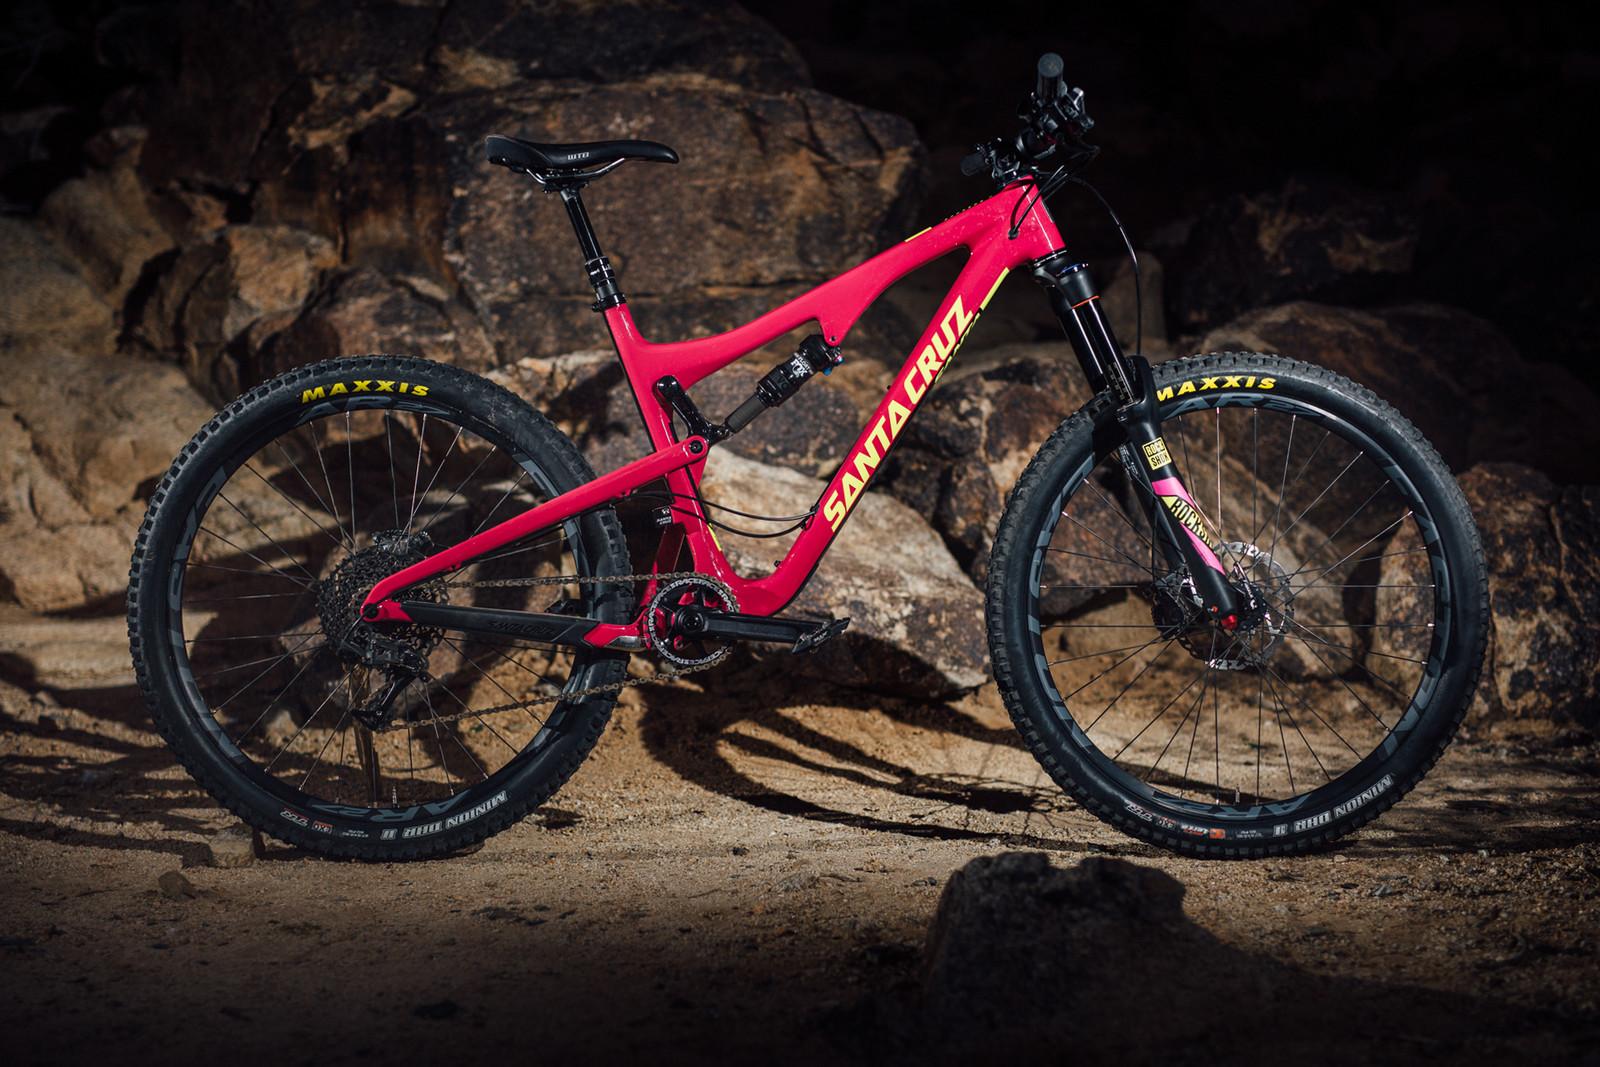 2016 Santa Cruz Bronson C S - 17 Bikes Tested - 2016 Vital MTB Test Sessions - Mountain Biking Pictures - Vital MTB